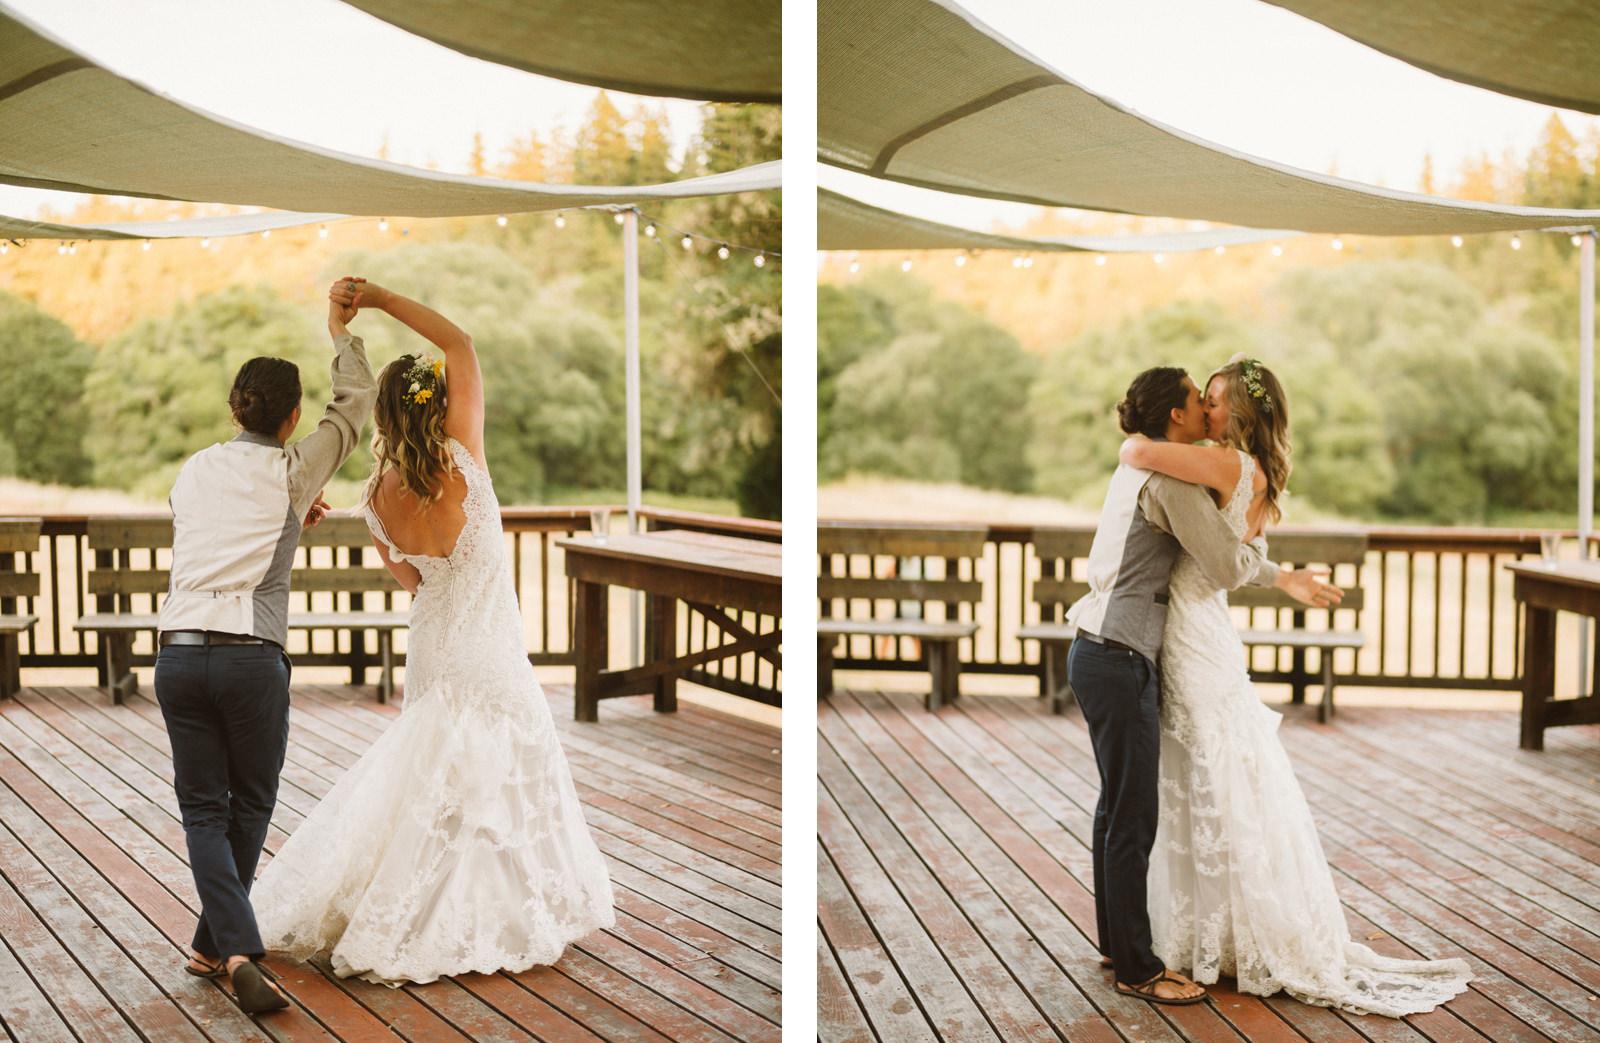 rivers-bend-retreat-wedding-101 RIVER'S BEND RETREAT WEDDING